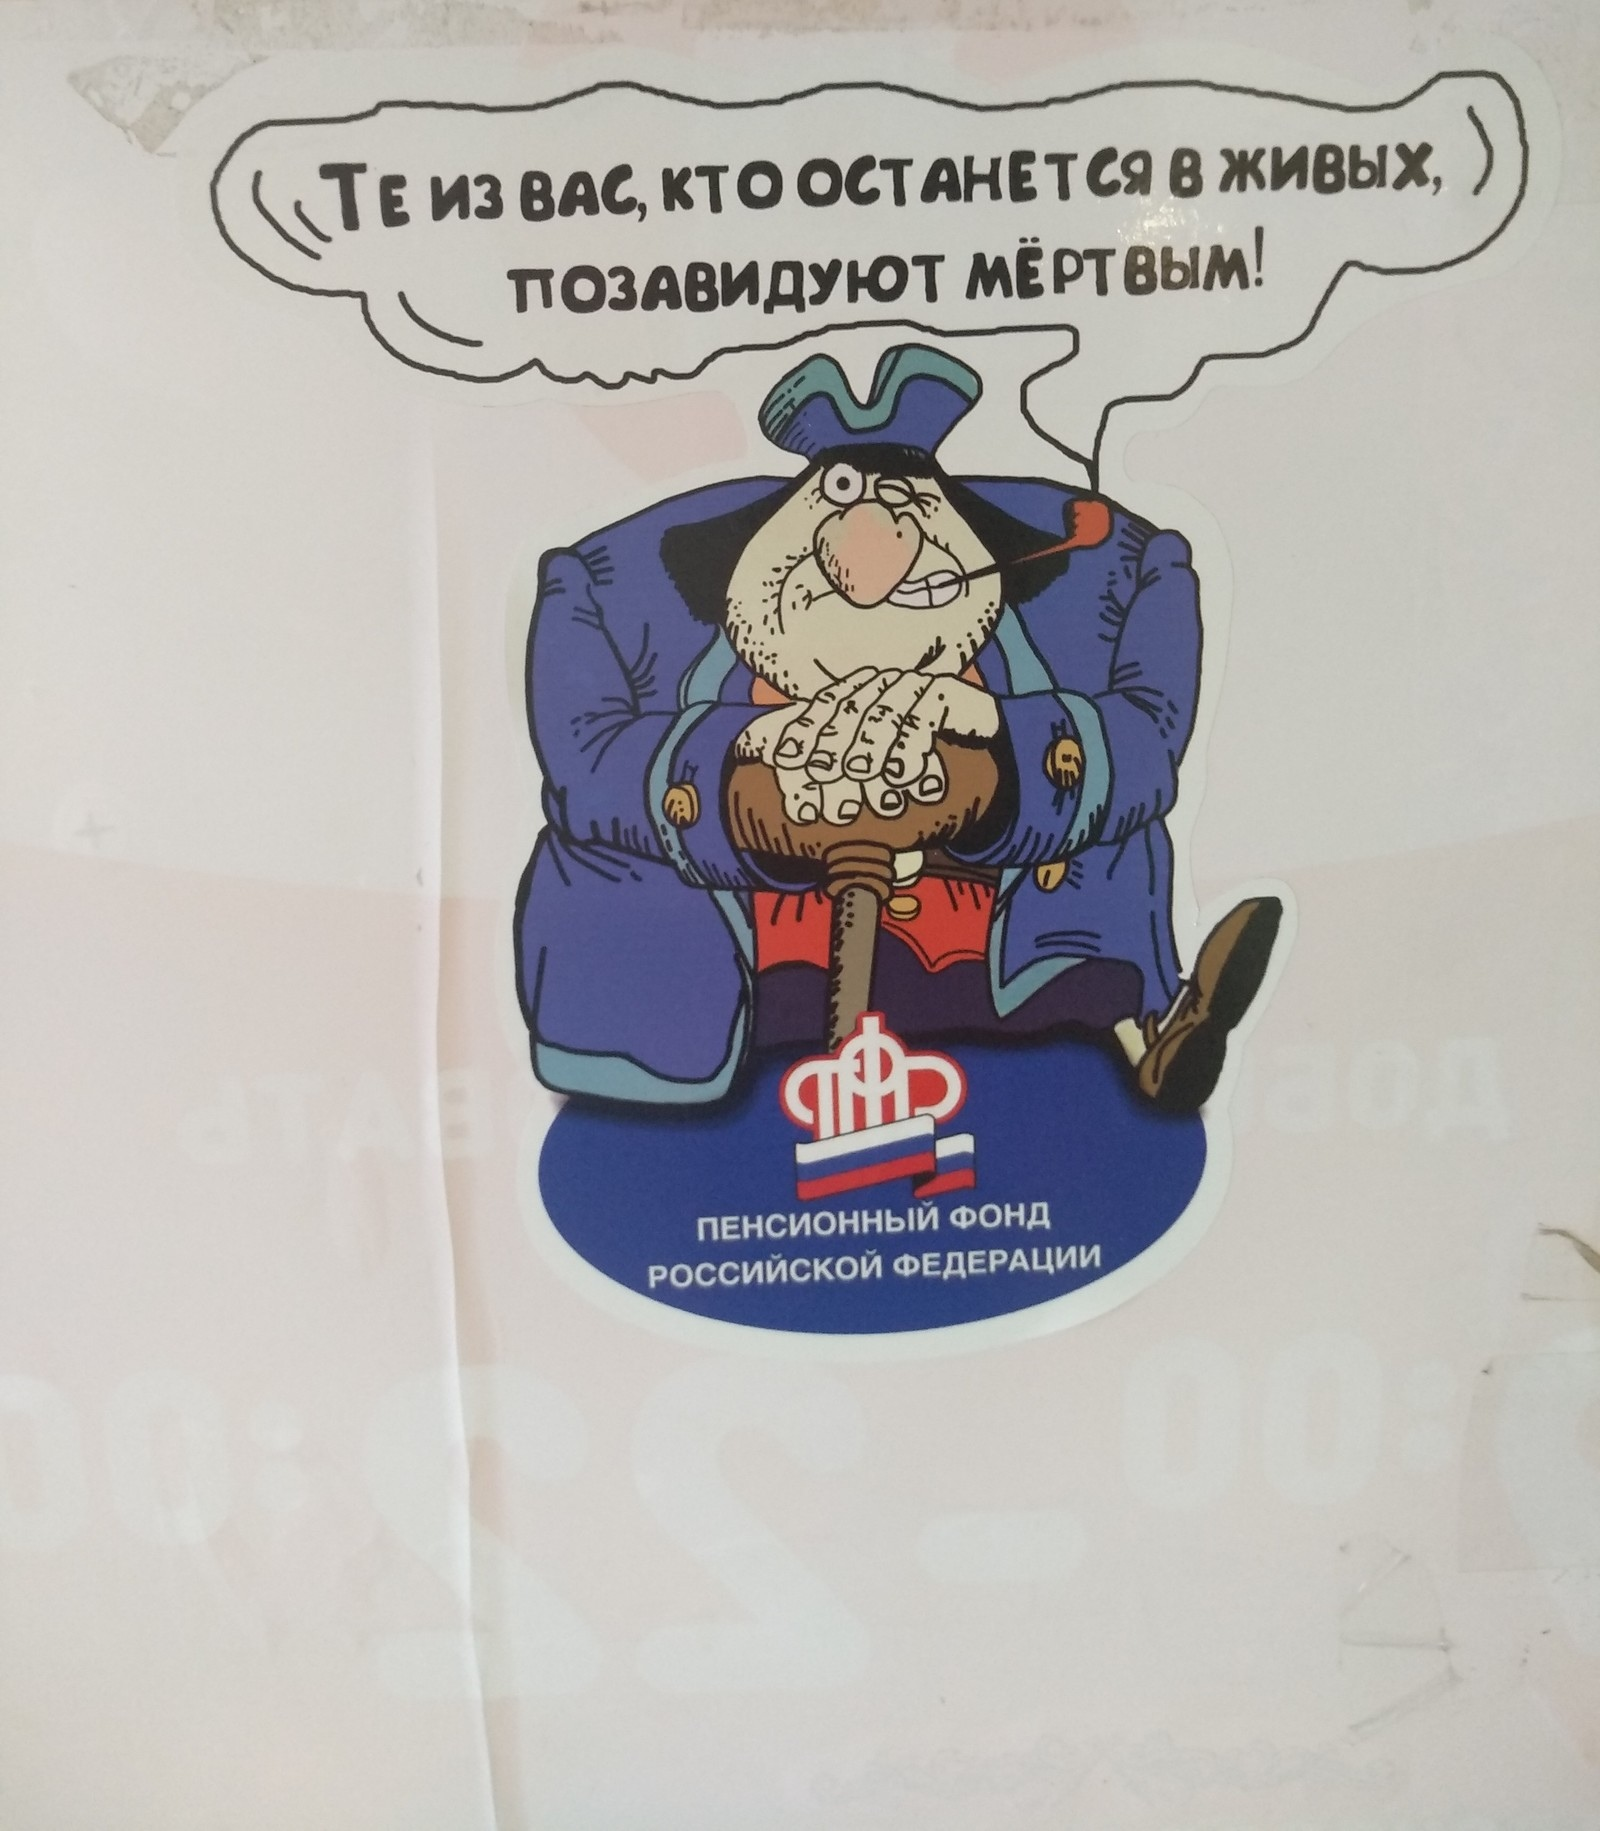 Про пенсию в РФ